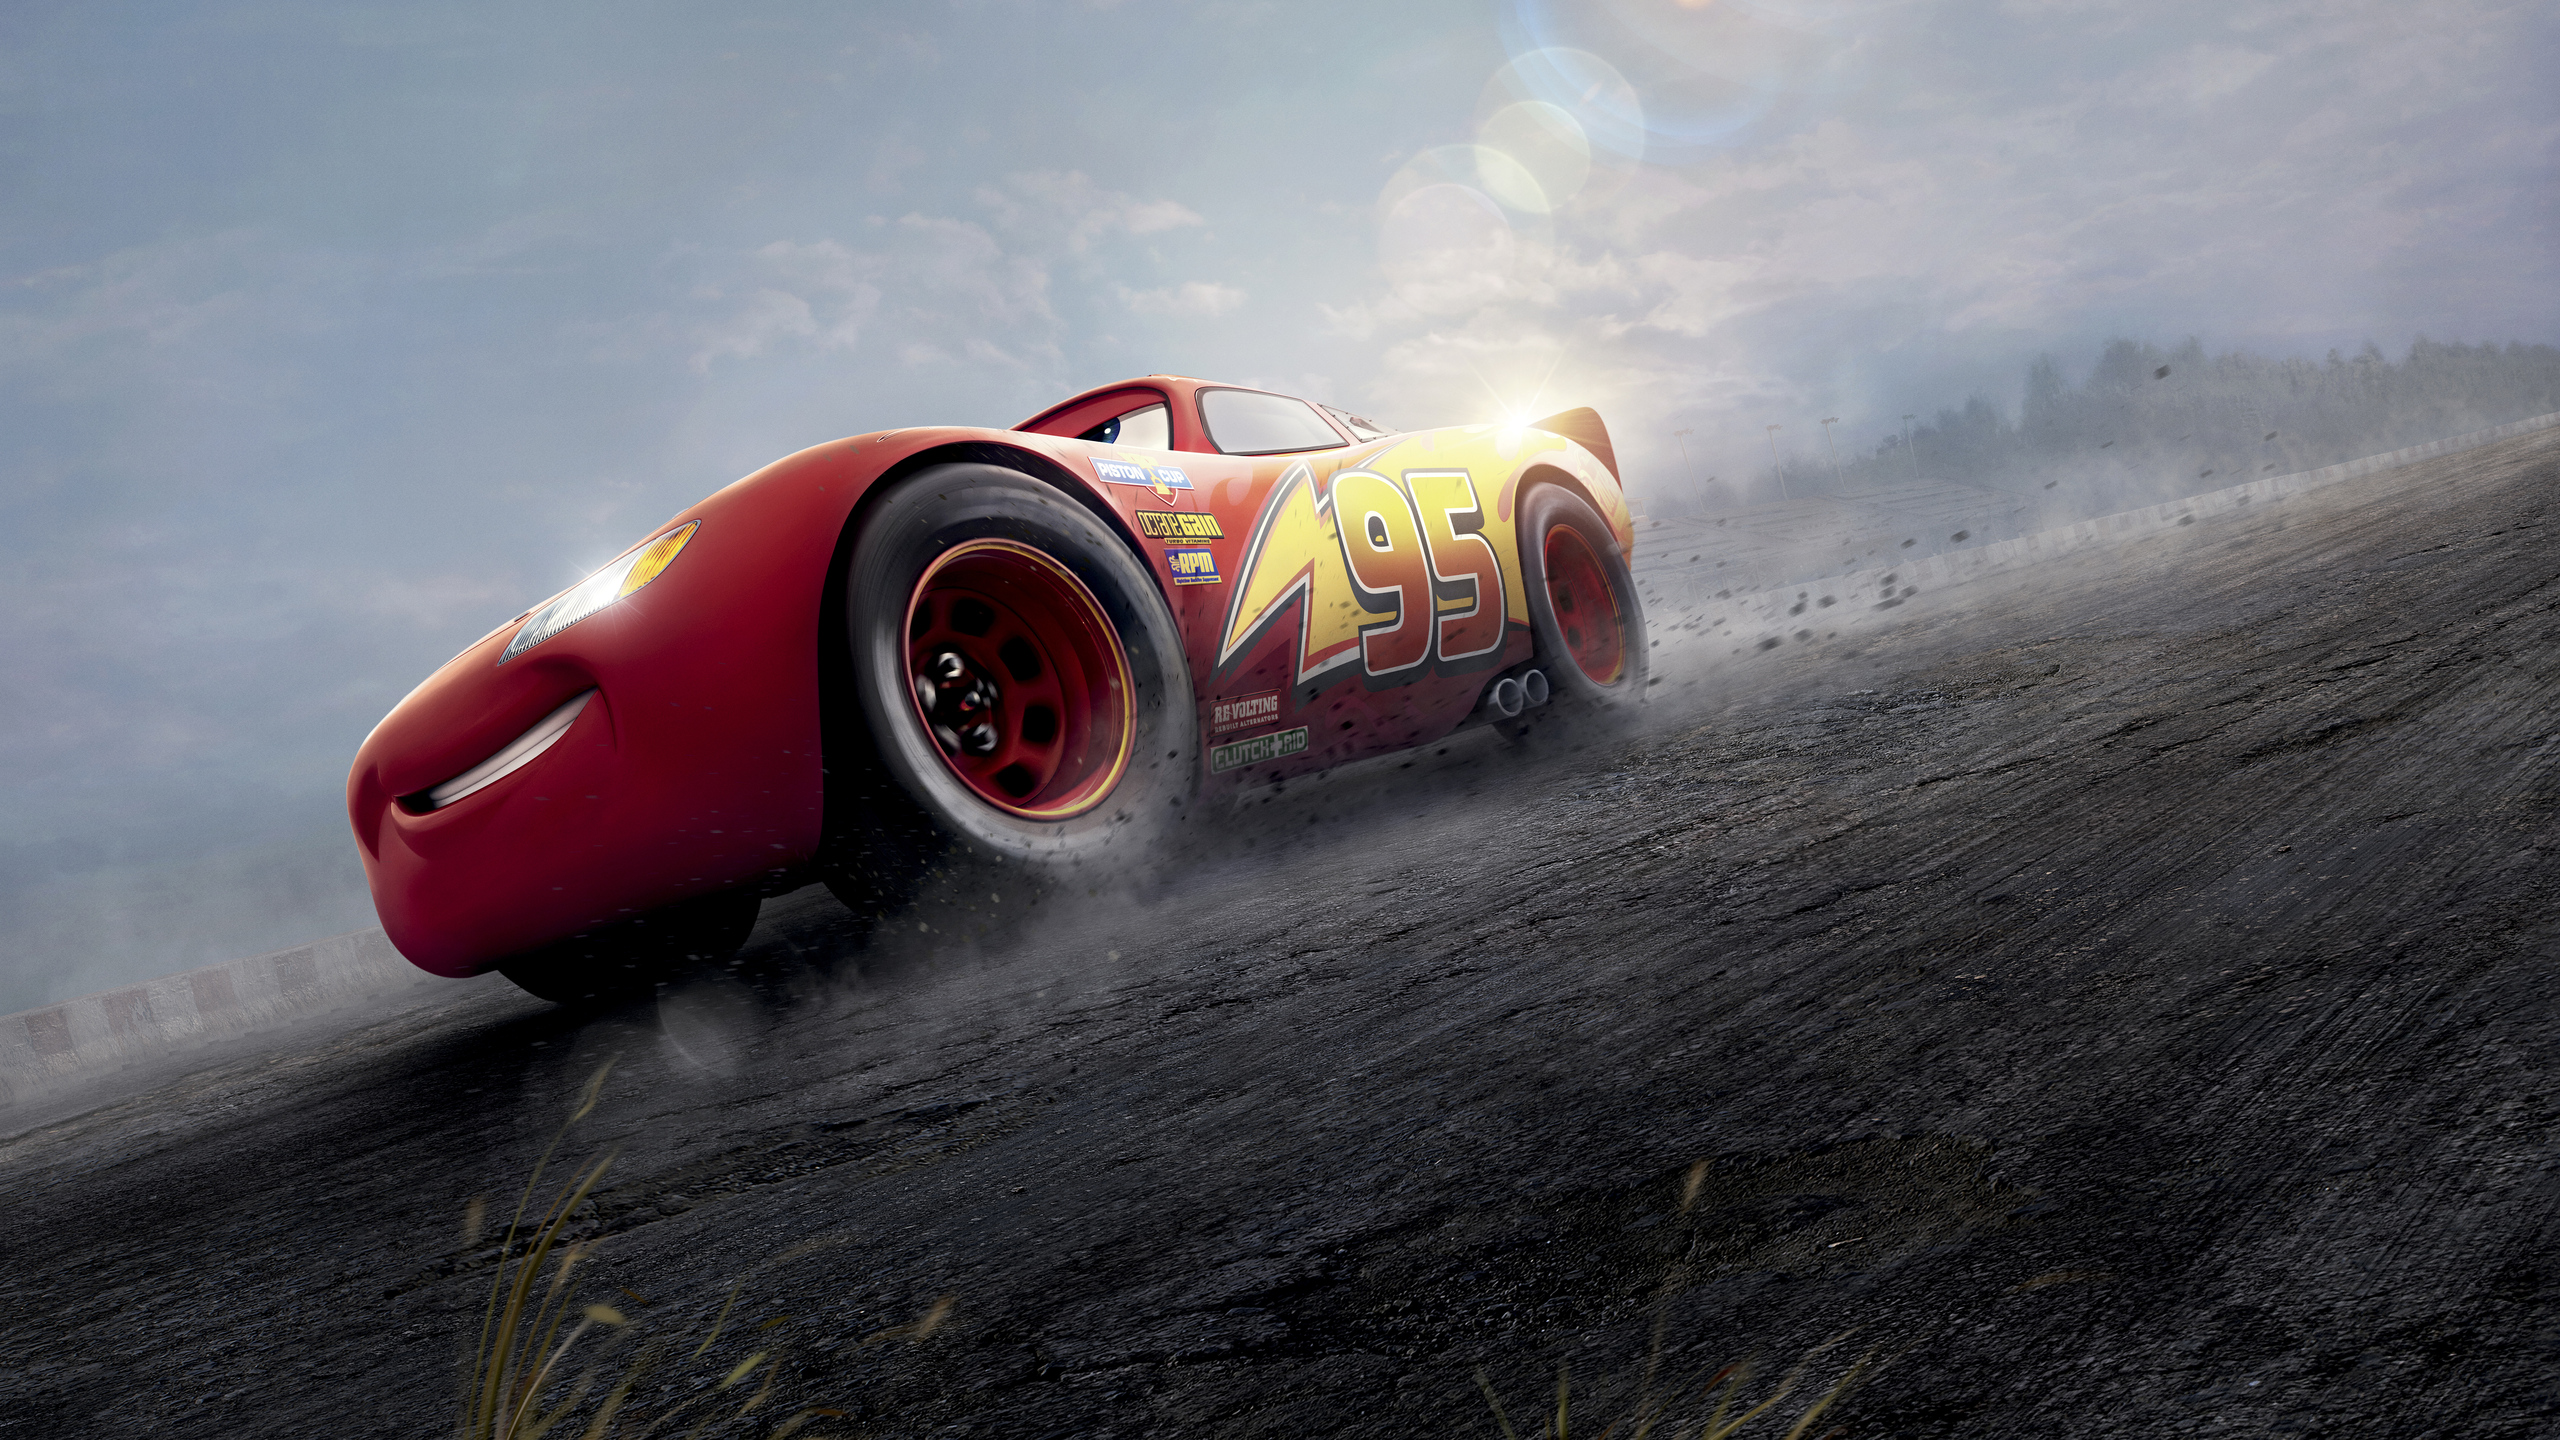 2560x1440 Cars 3 Red Lightning McQueen 8k 1440P Resolution ...